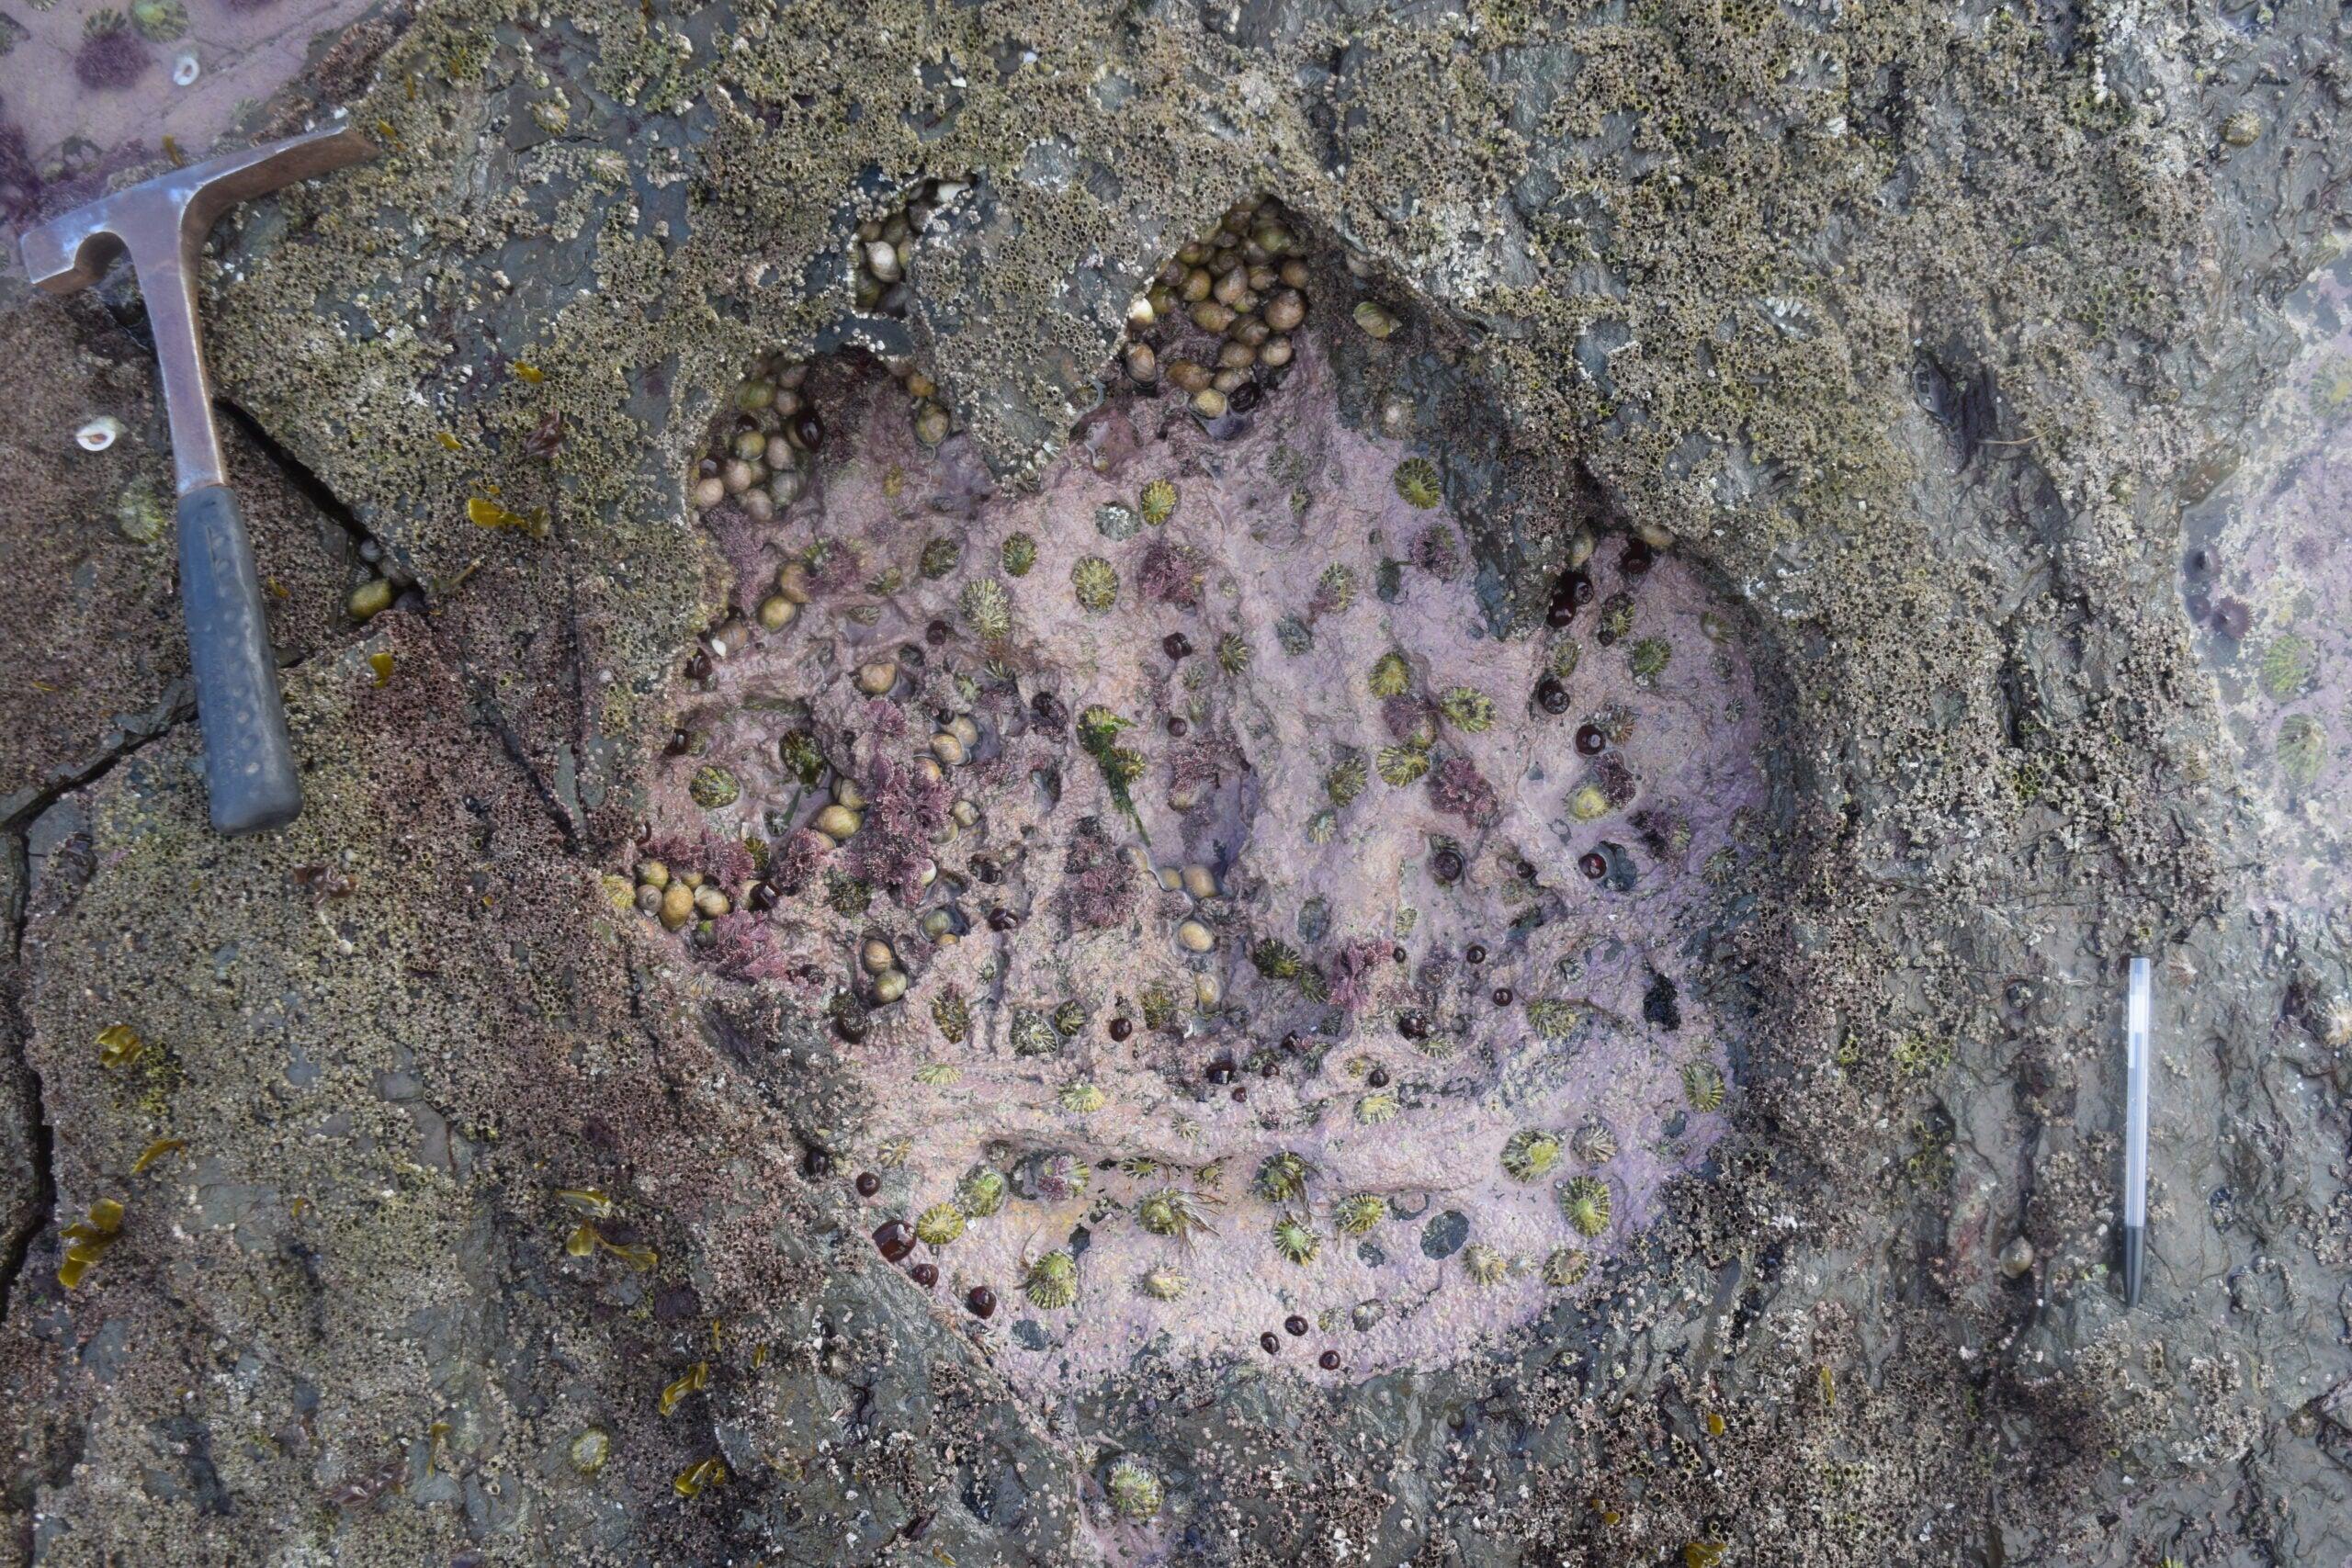 One dinosaur footprint is worth a thousand words